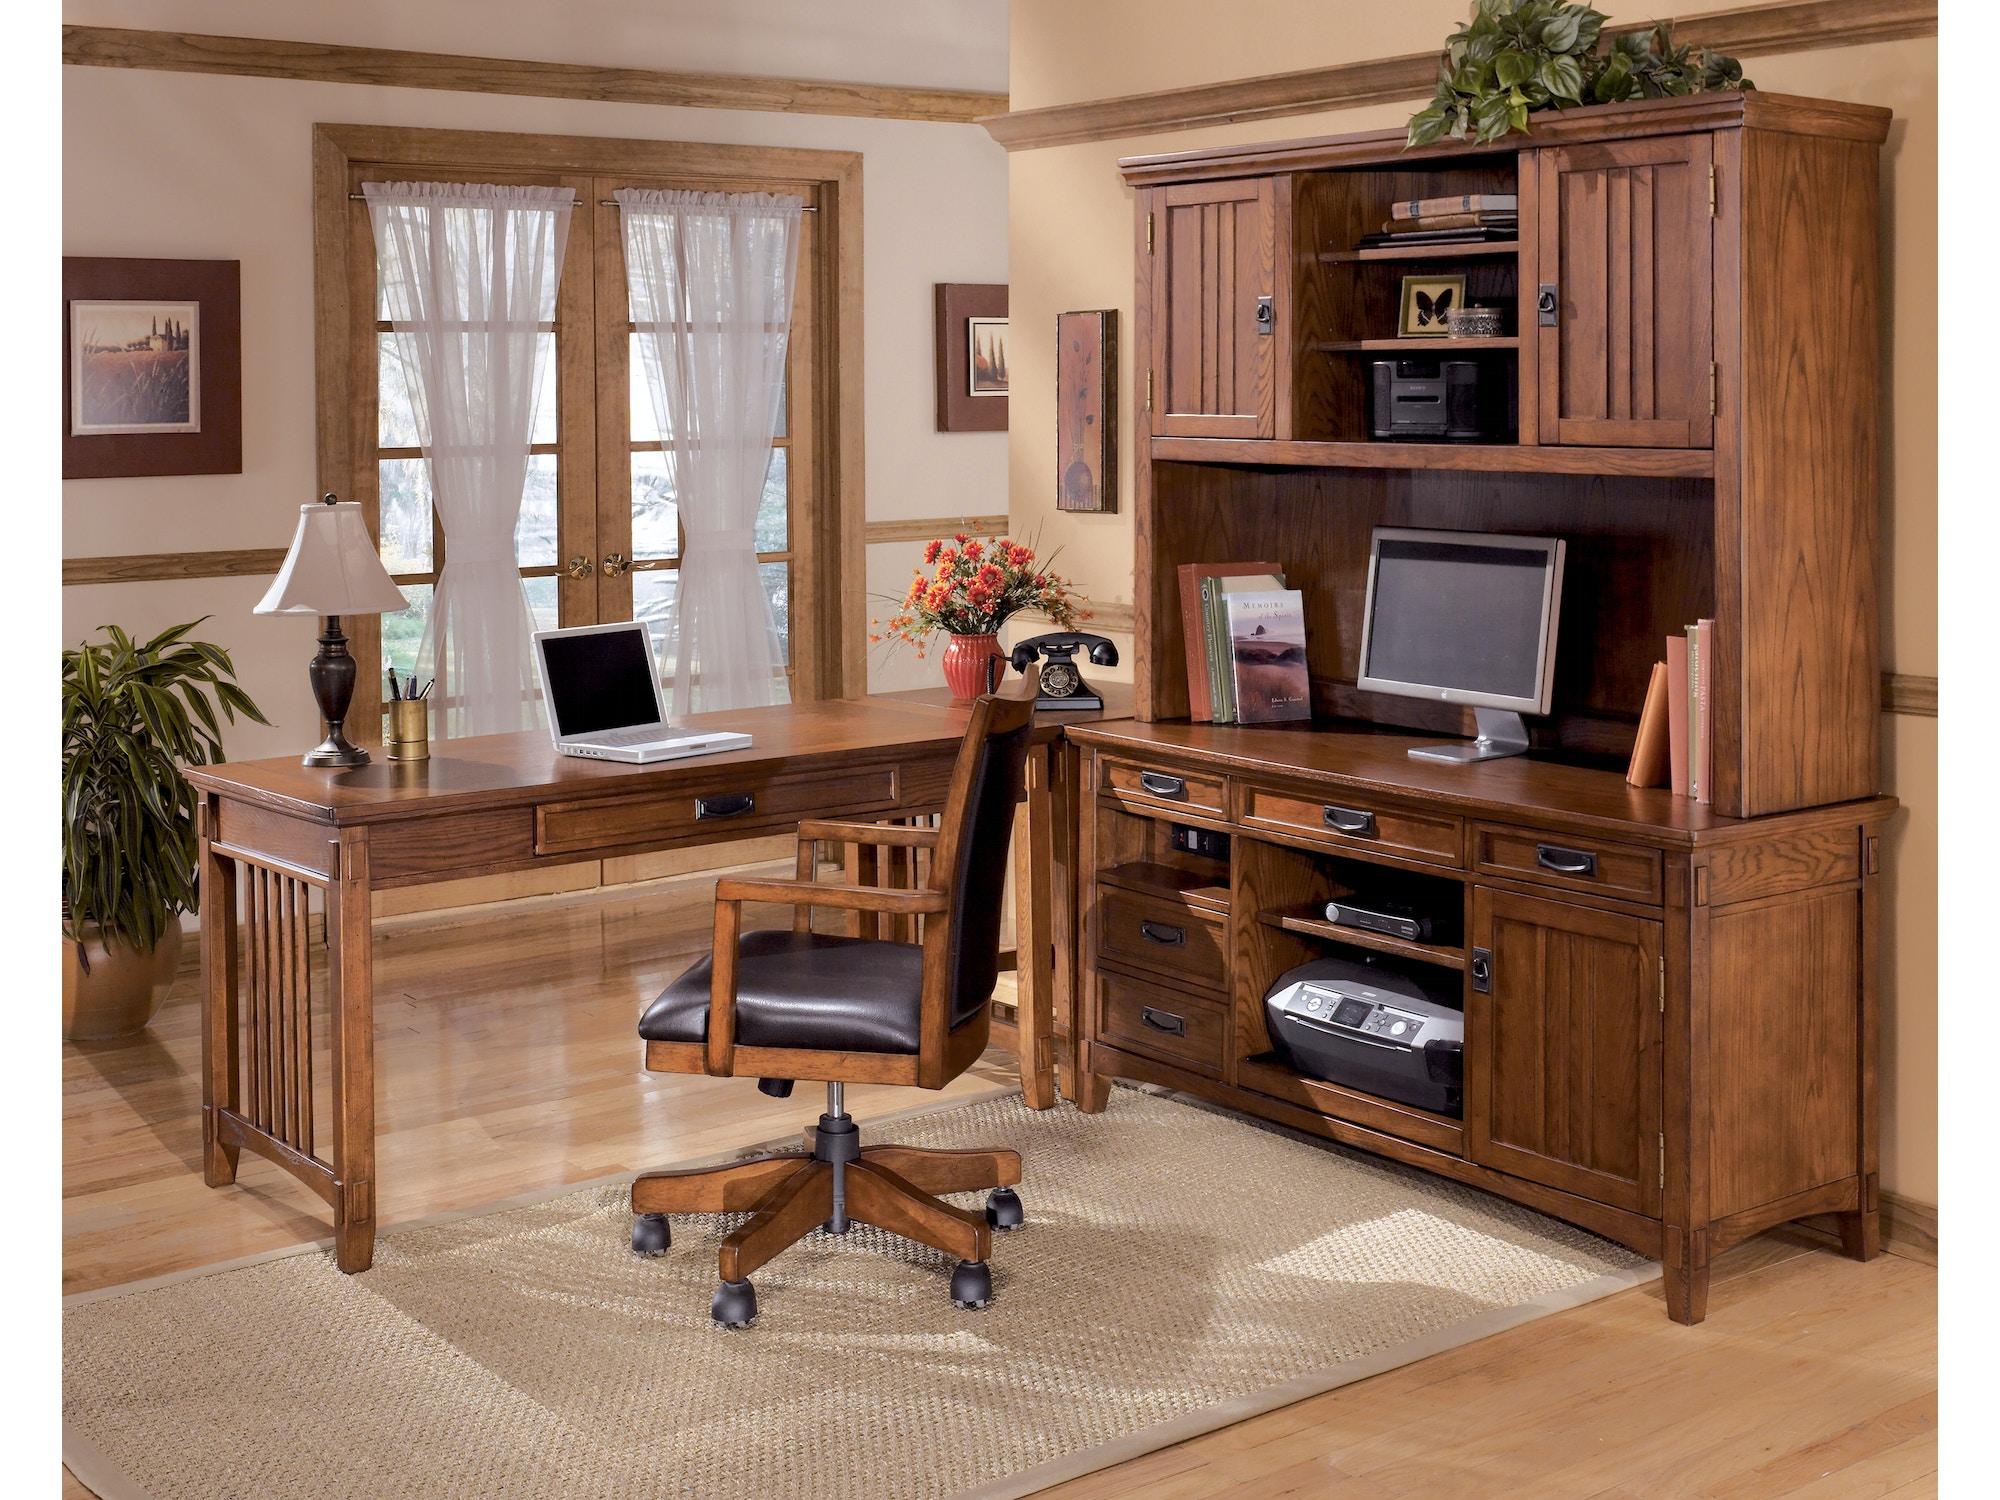 Home Office Furniture Cincinnati office furniture source shreveport elegant systems furniture cincinnati systems fice furniture cincinnati 448759 Cross Island Home Office